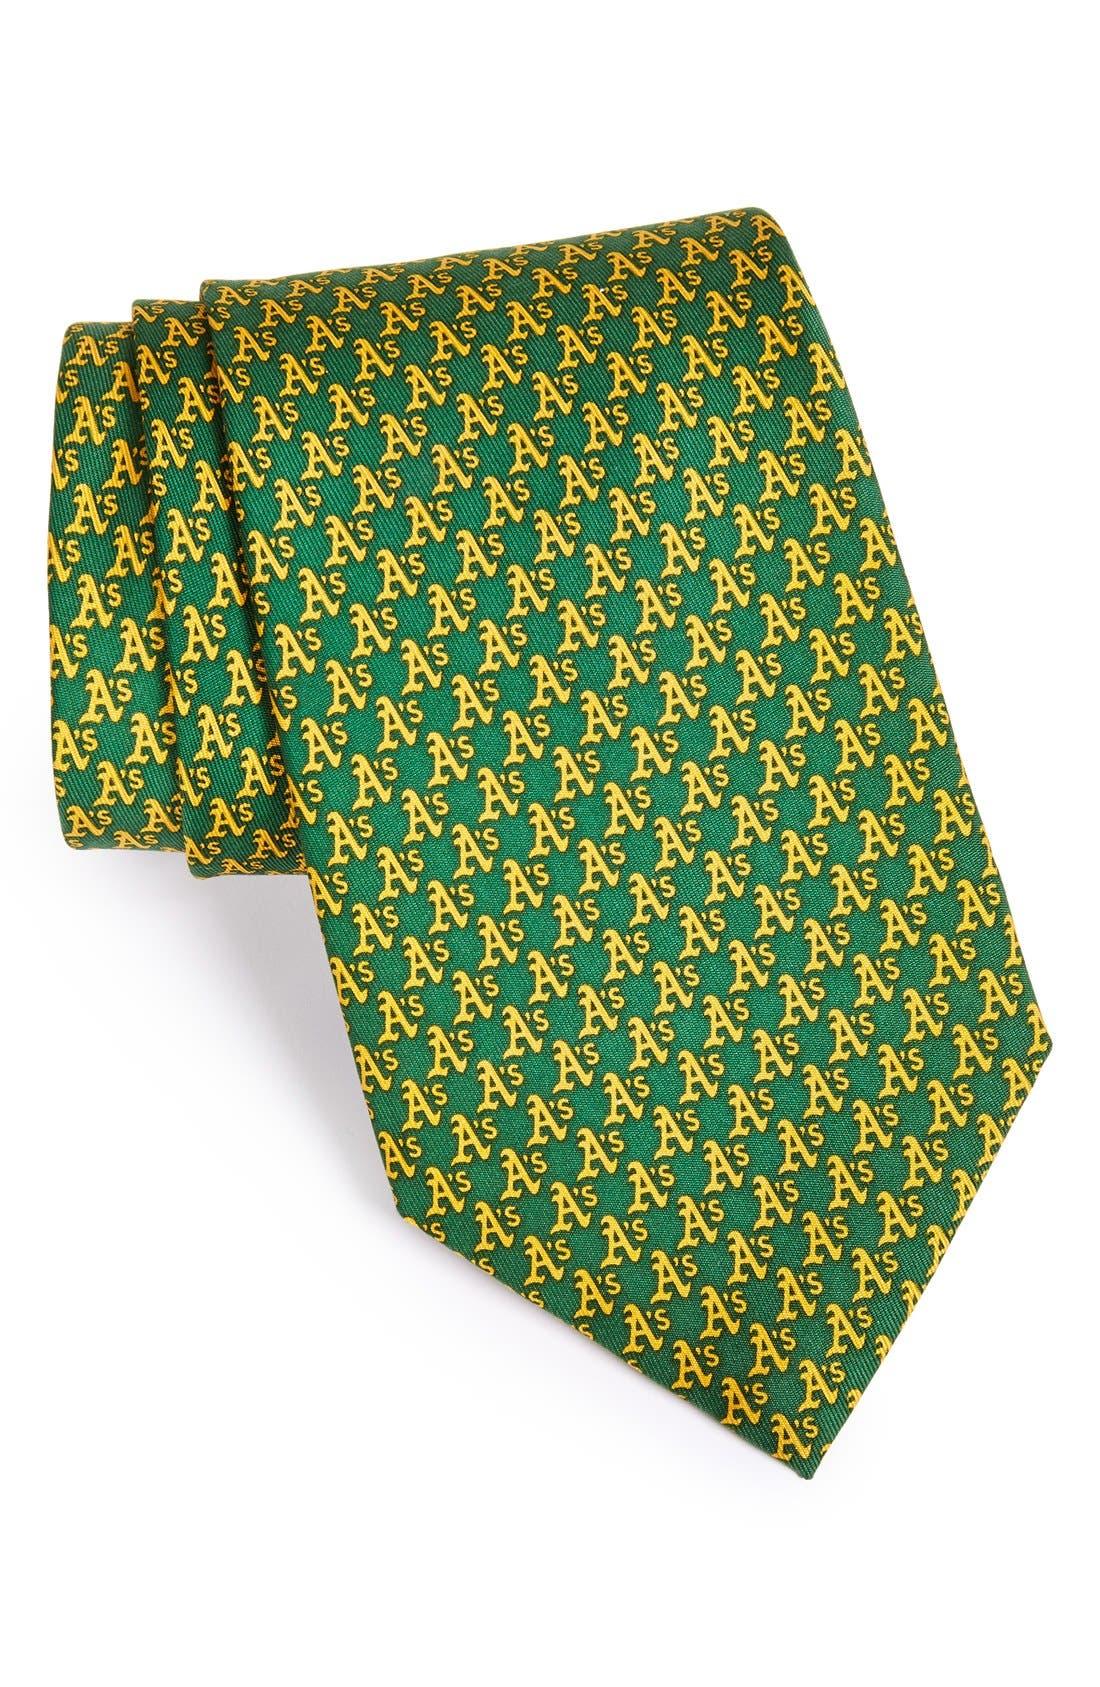 Alternate Image 1 Selected - vineyard vines Oakland Athletics - MLB Woven Silk Tie